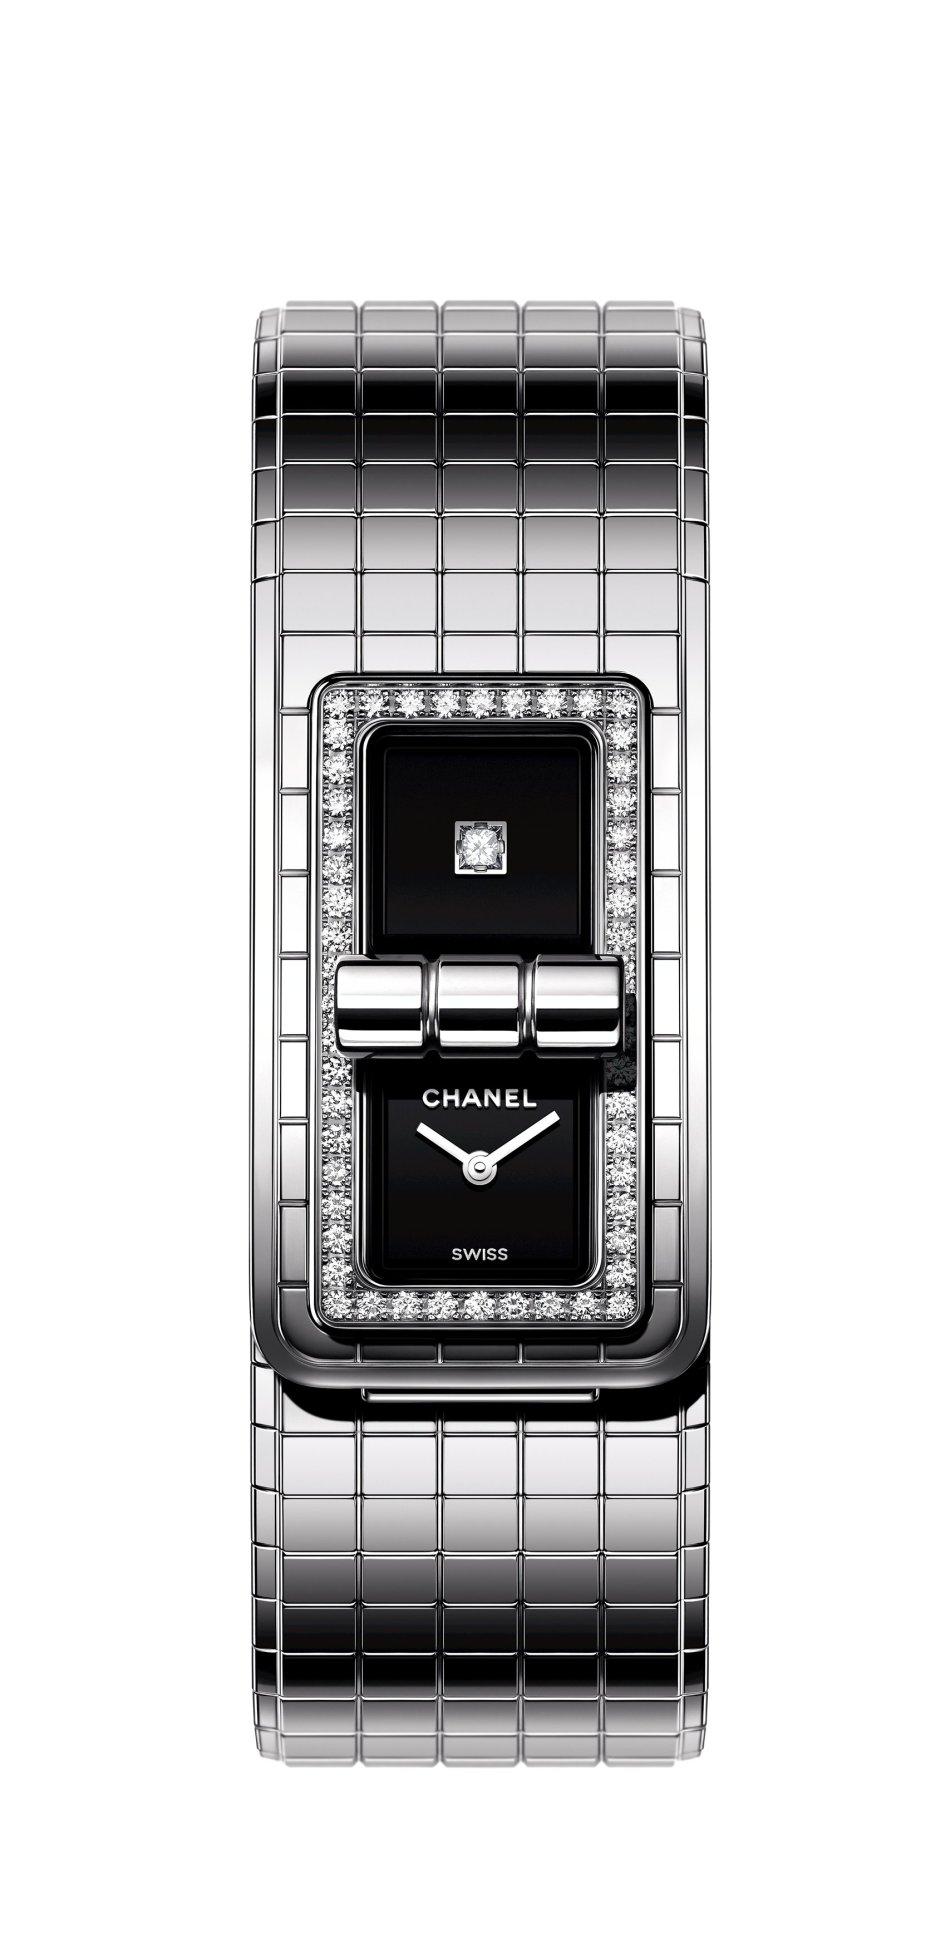 Chanel CODE COCO_FERMEE